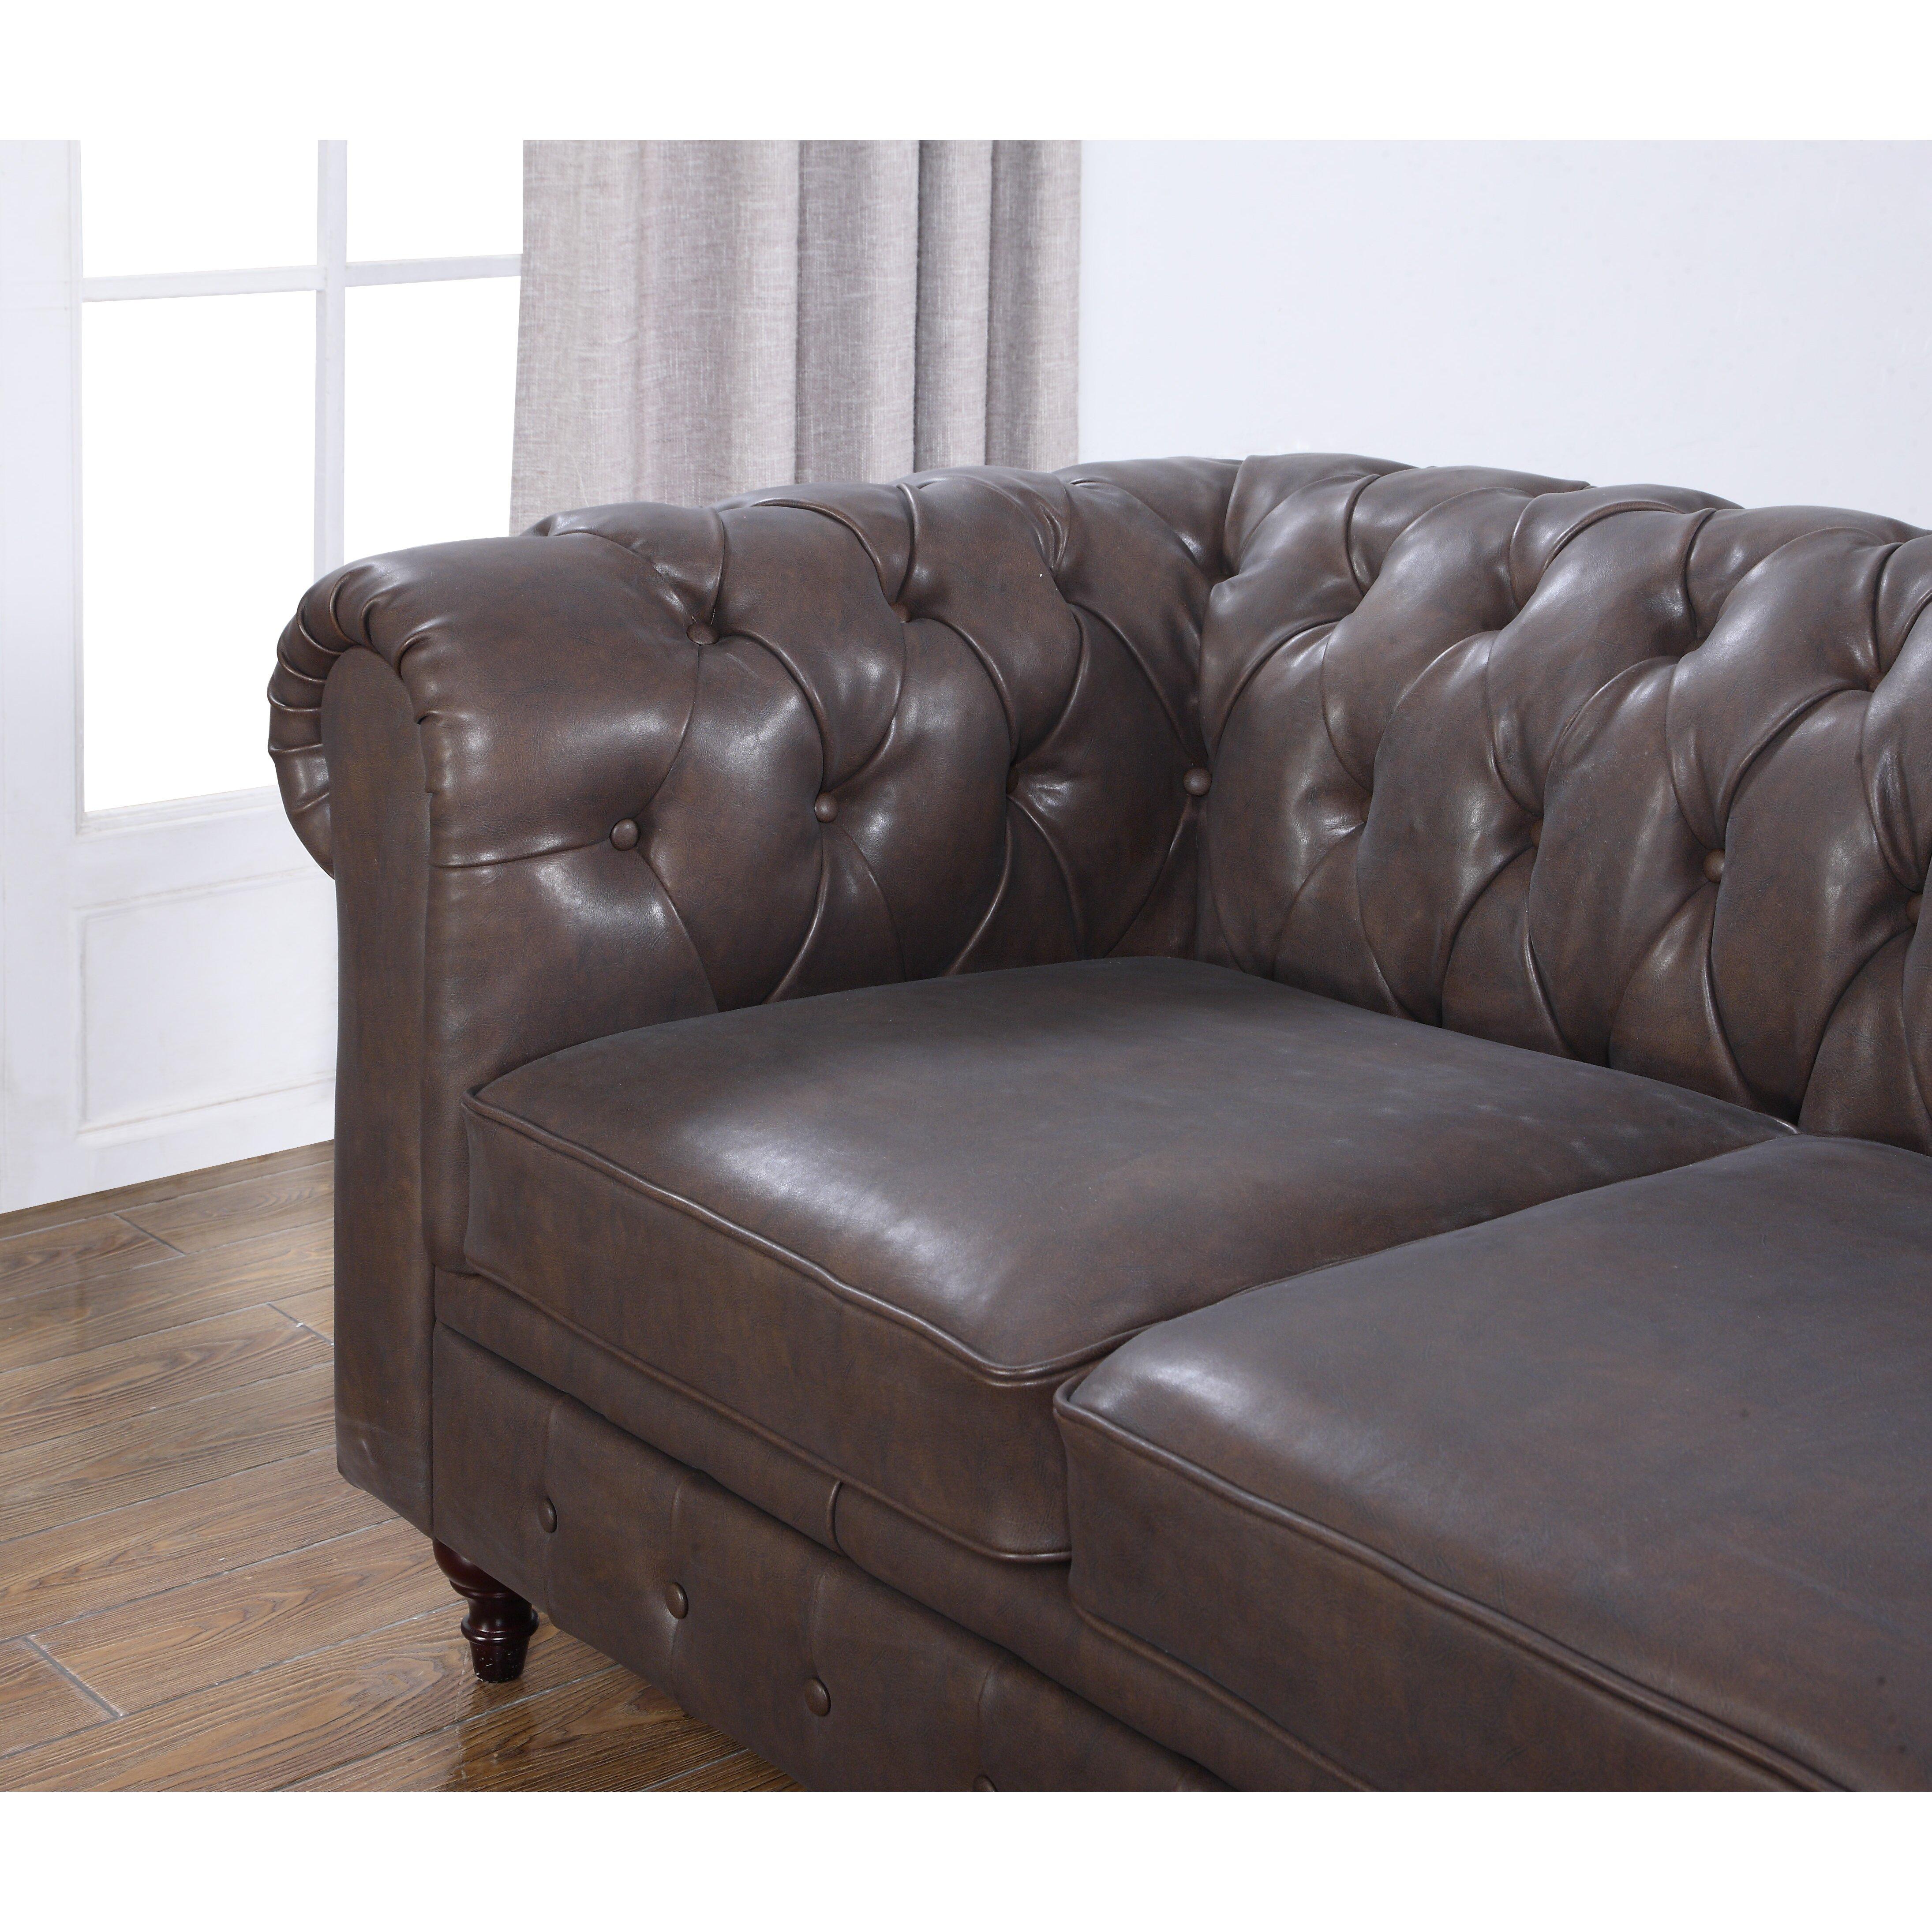 Chesterfield Leather Sofas Sofa Model Ideas